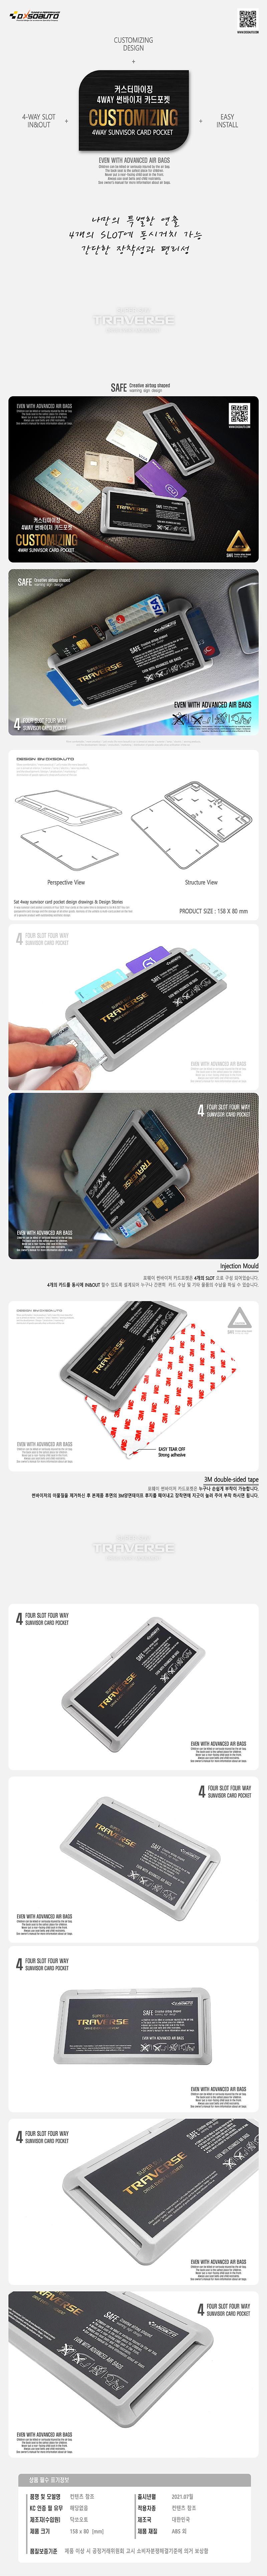 [DXSOAUTO] 커스터마이징 4WAY 썬바이저 카드포켓 (1EA / 1SET) 트래버스 실버